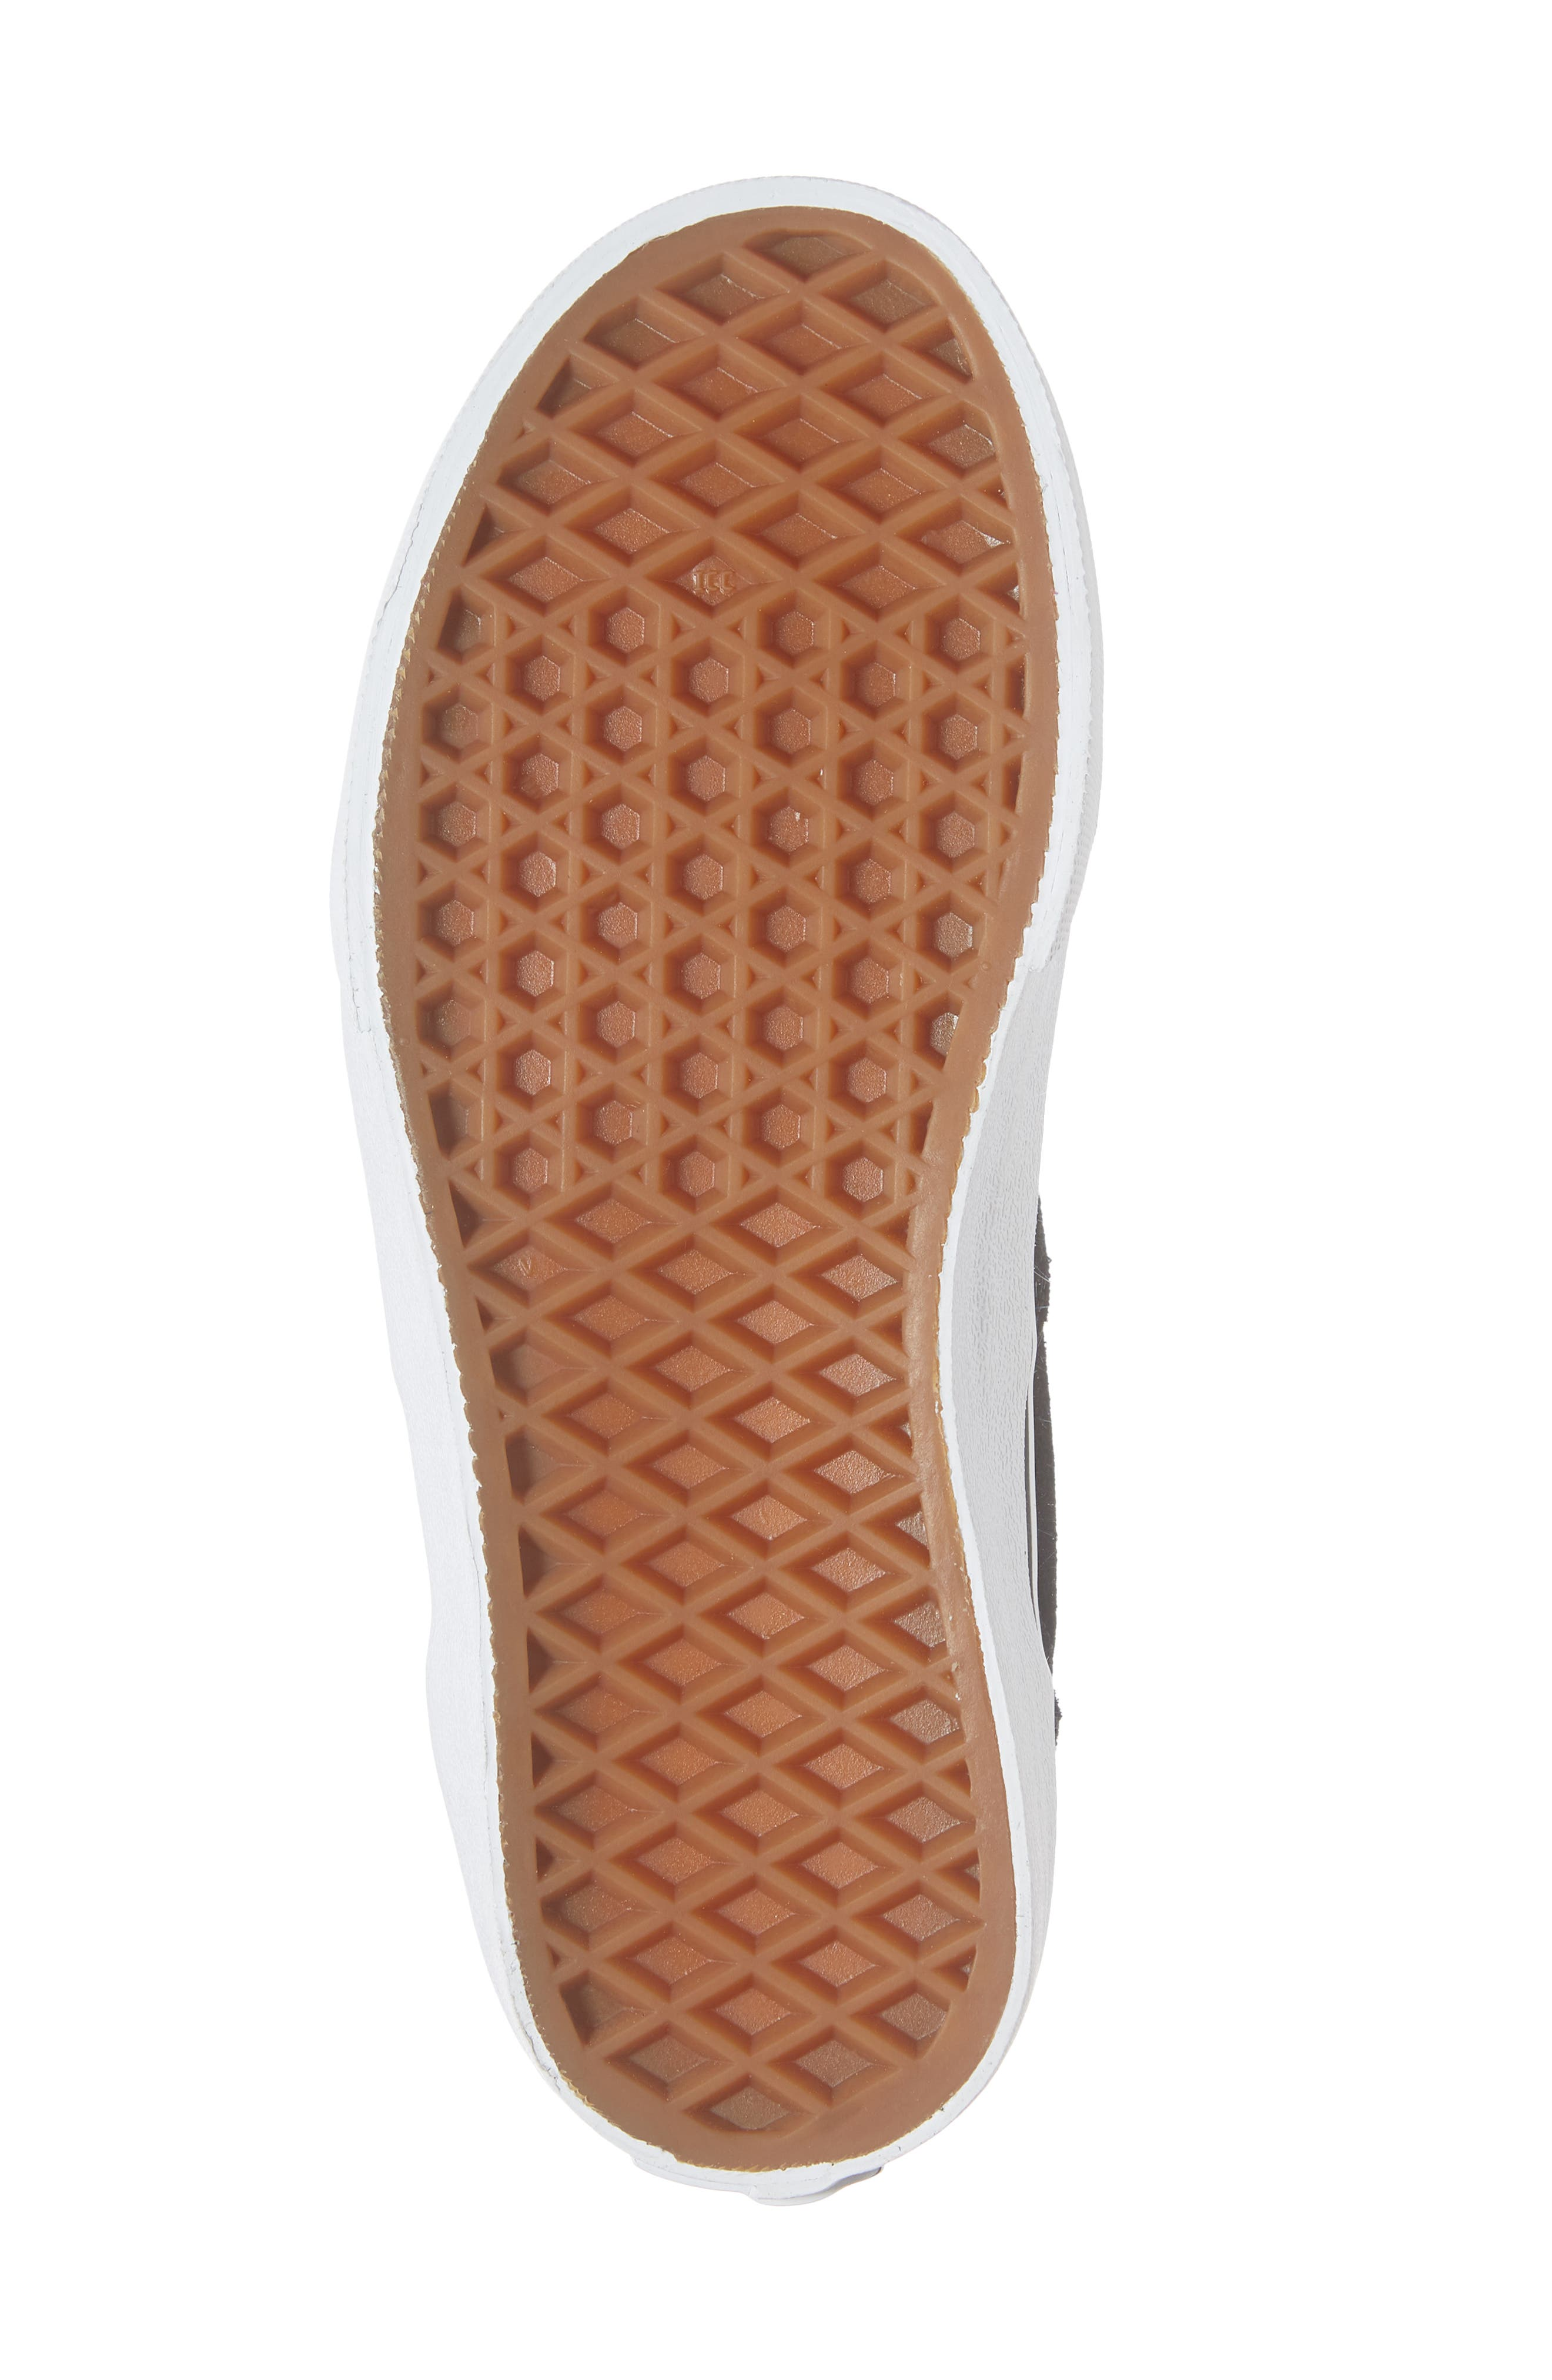 Old Skool Zip Sneaker,                             Alternate thumbnail 6, color,                             SUEDE ALLOY/ PINK/ TRUE WHITE